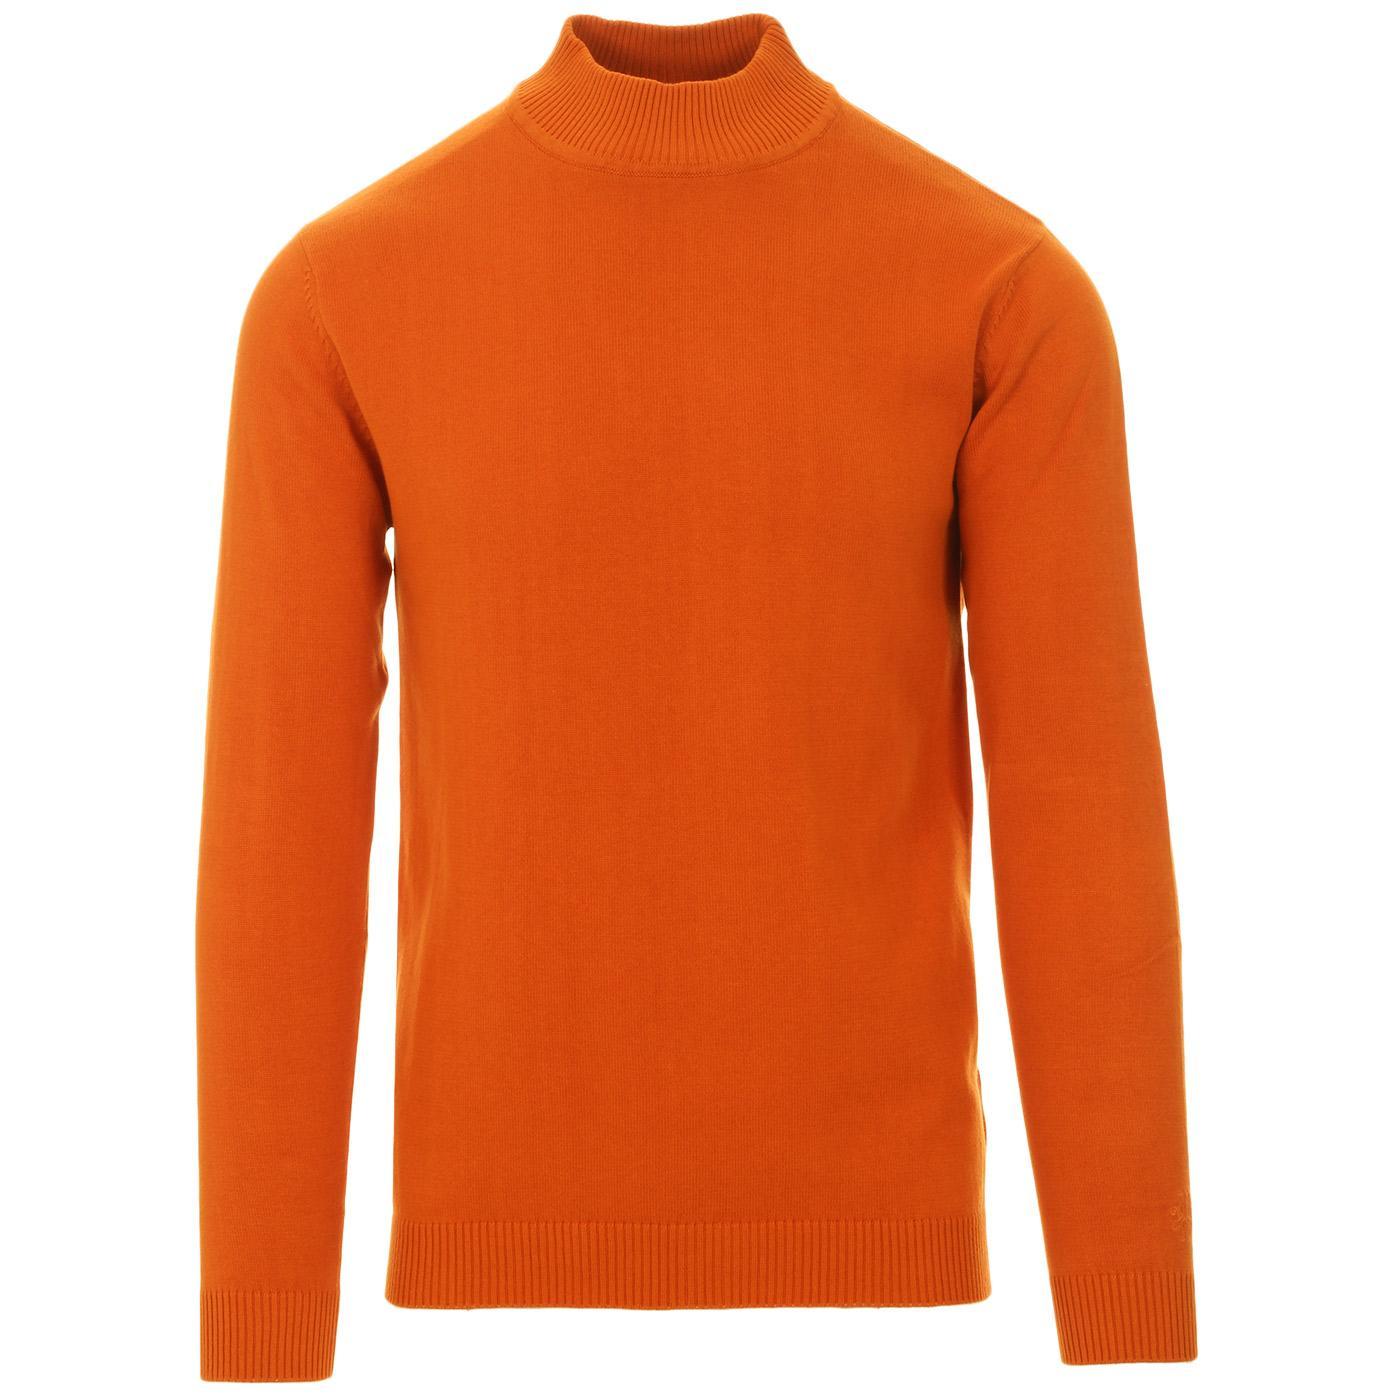 Madcap England Eastwood 60s Mod Knitted Mock Turtleneck Jumper in Marmalade